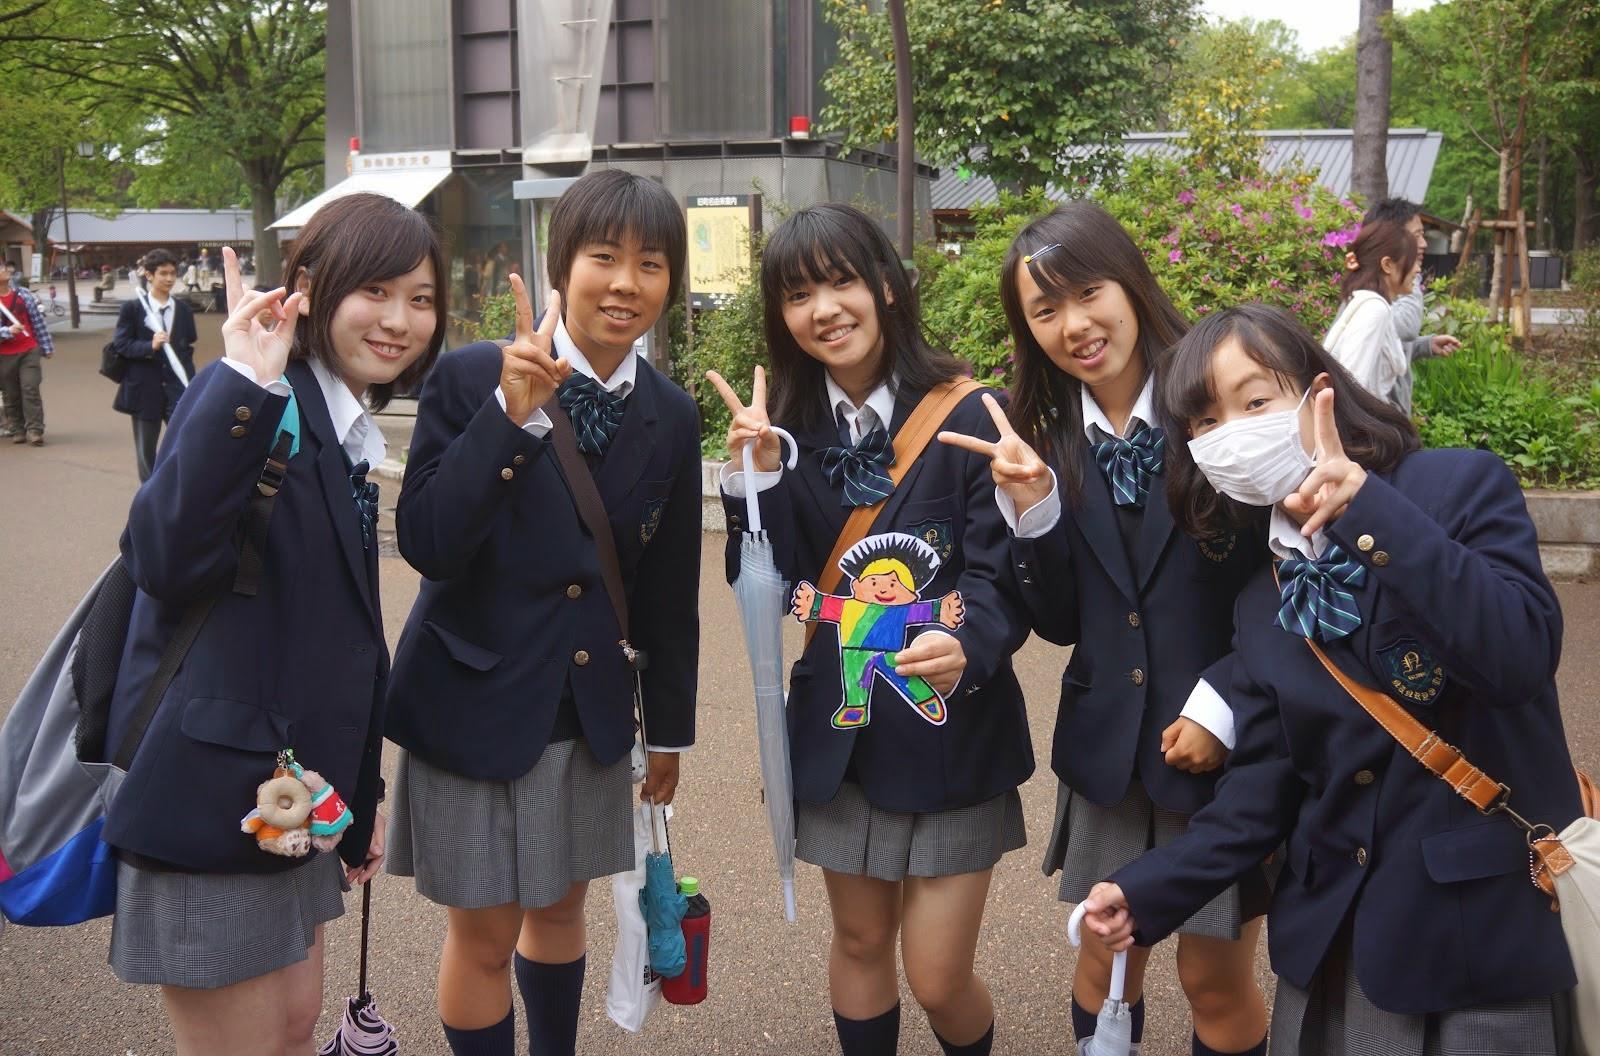 Yusuke Japan Blog: Do you wear a uniform at your school?